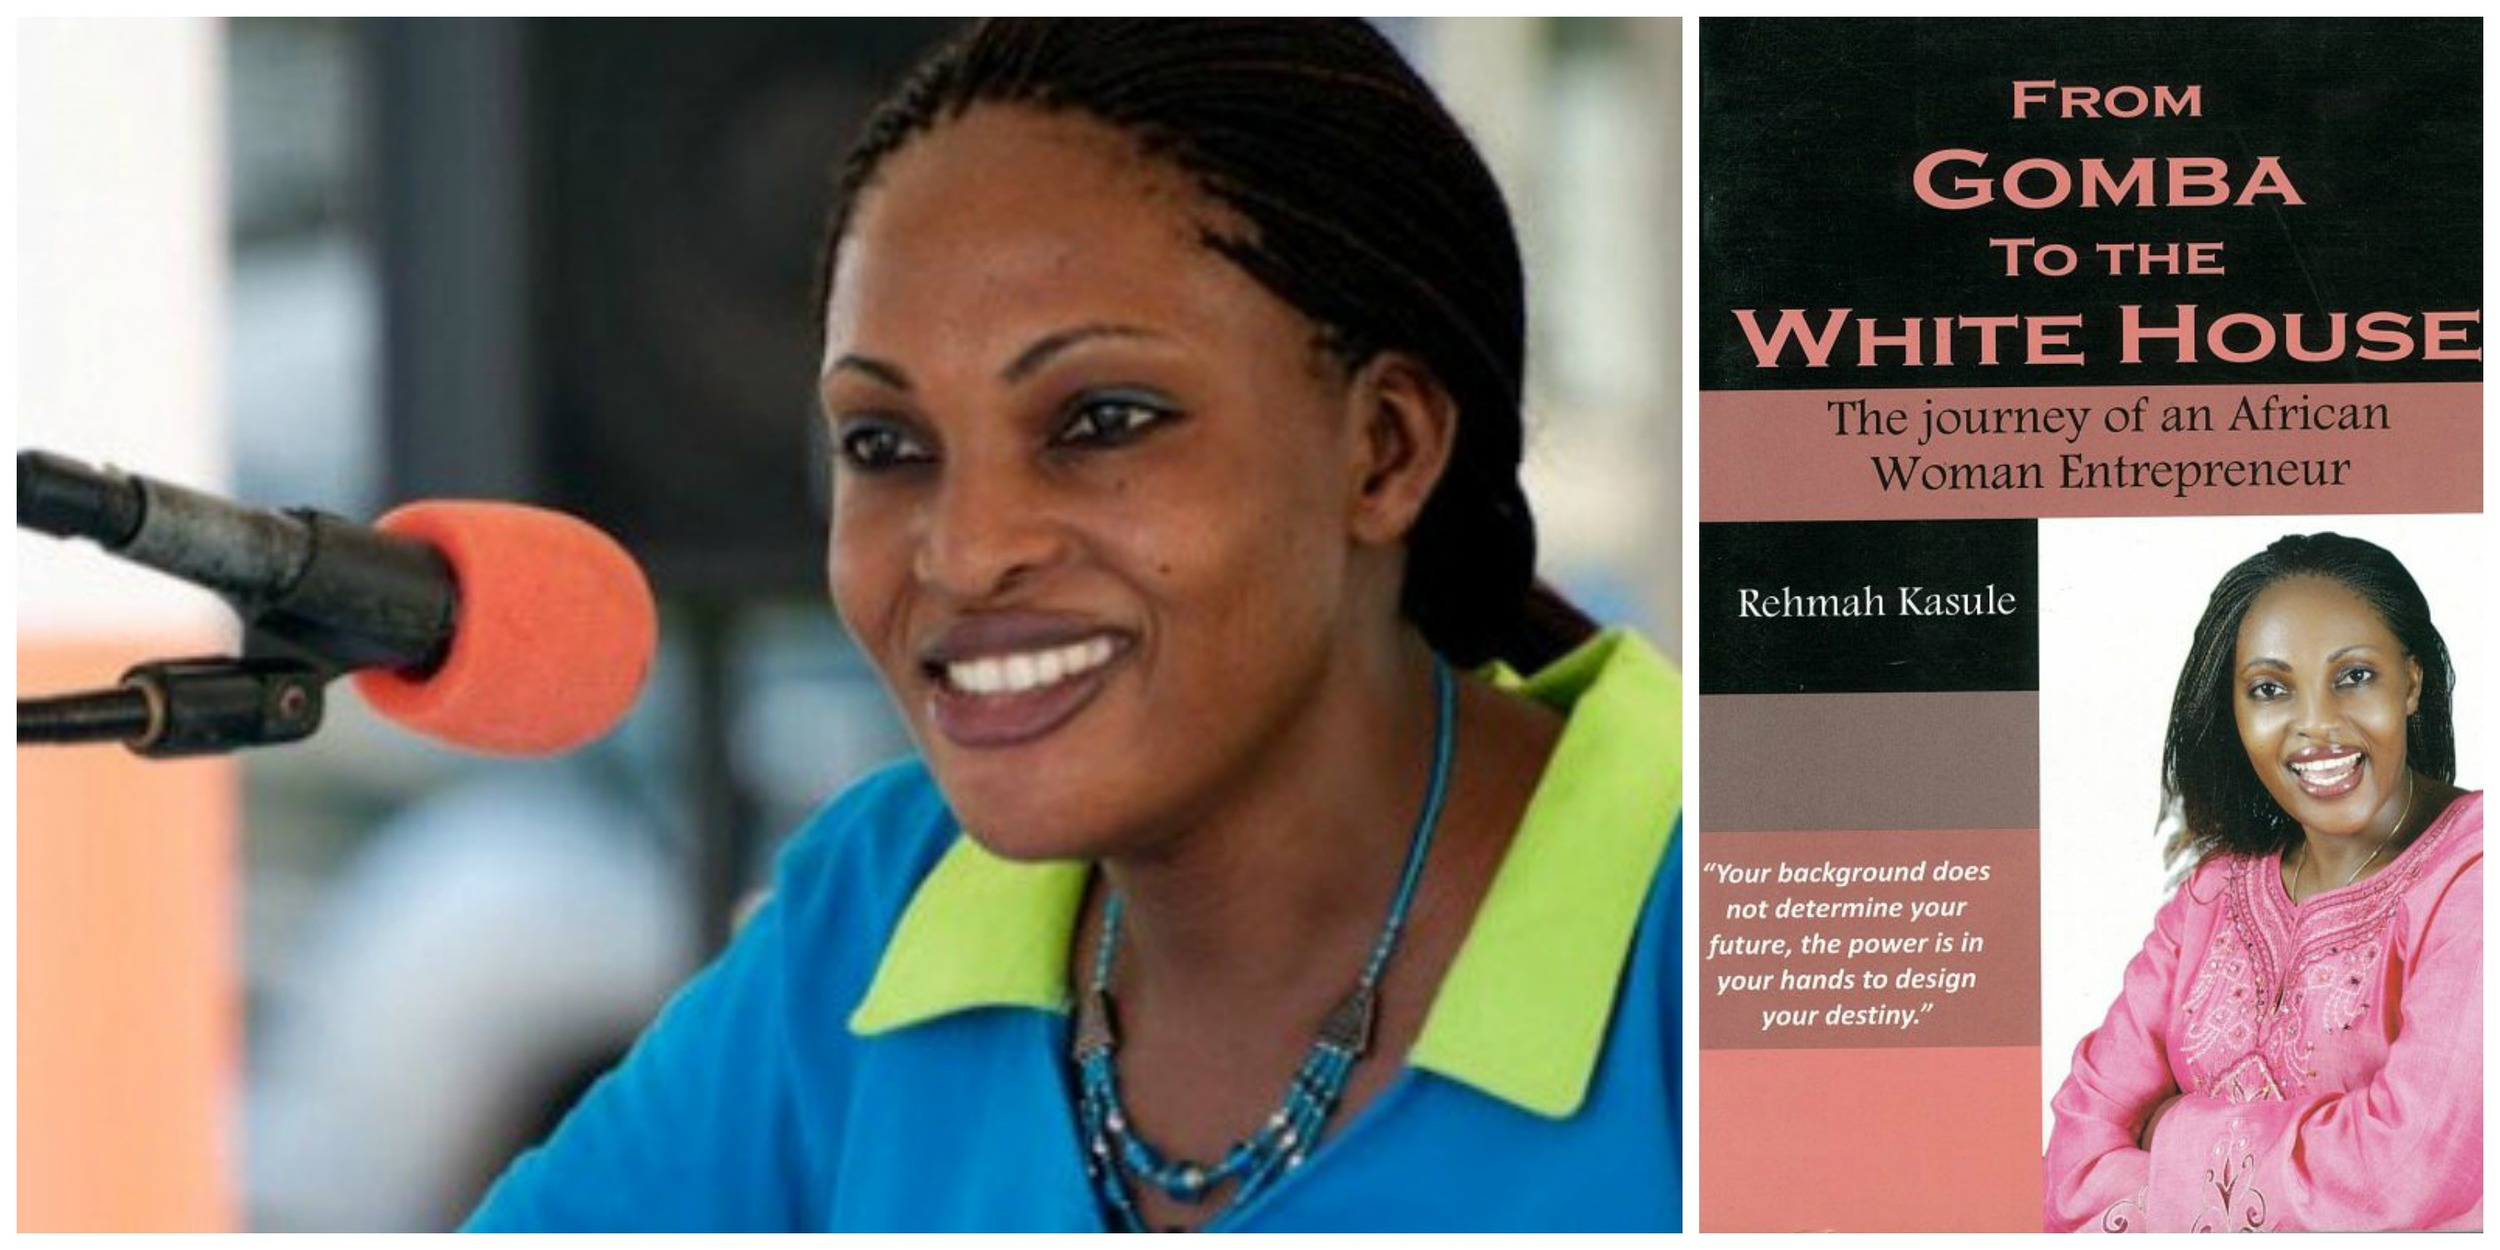 Rehmah Kasule , author and entrepreneur